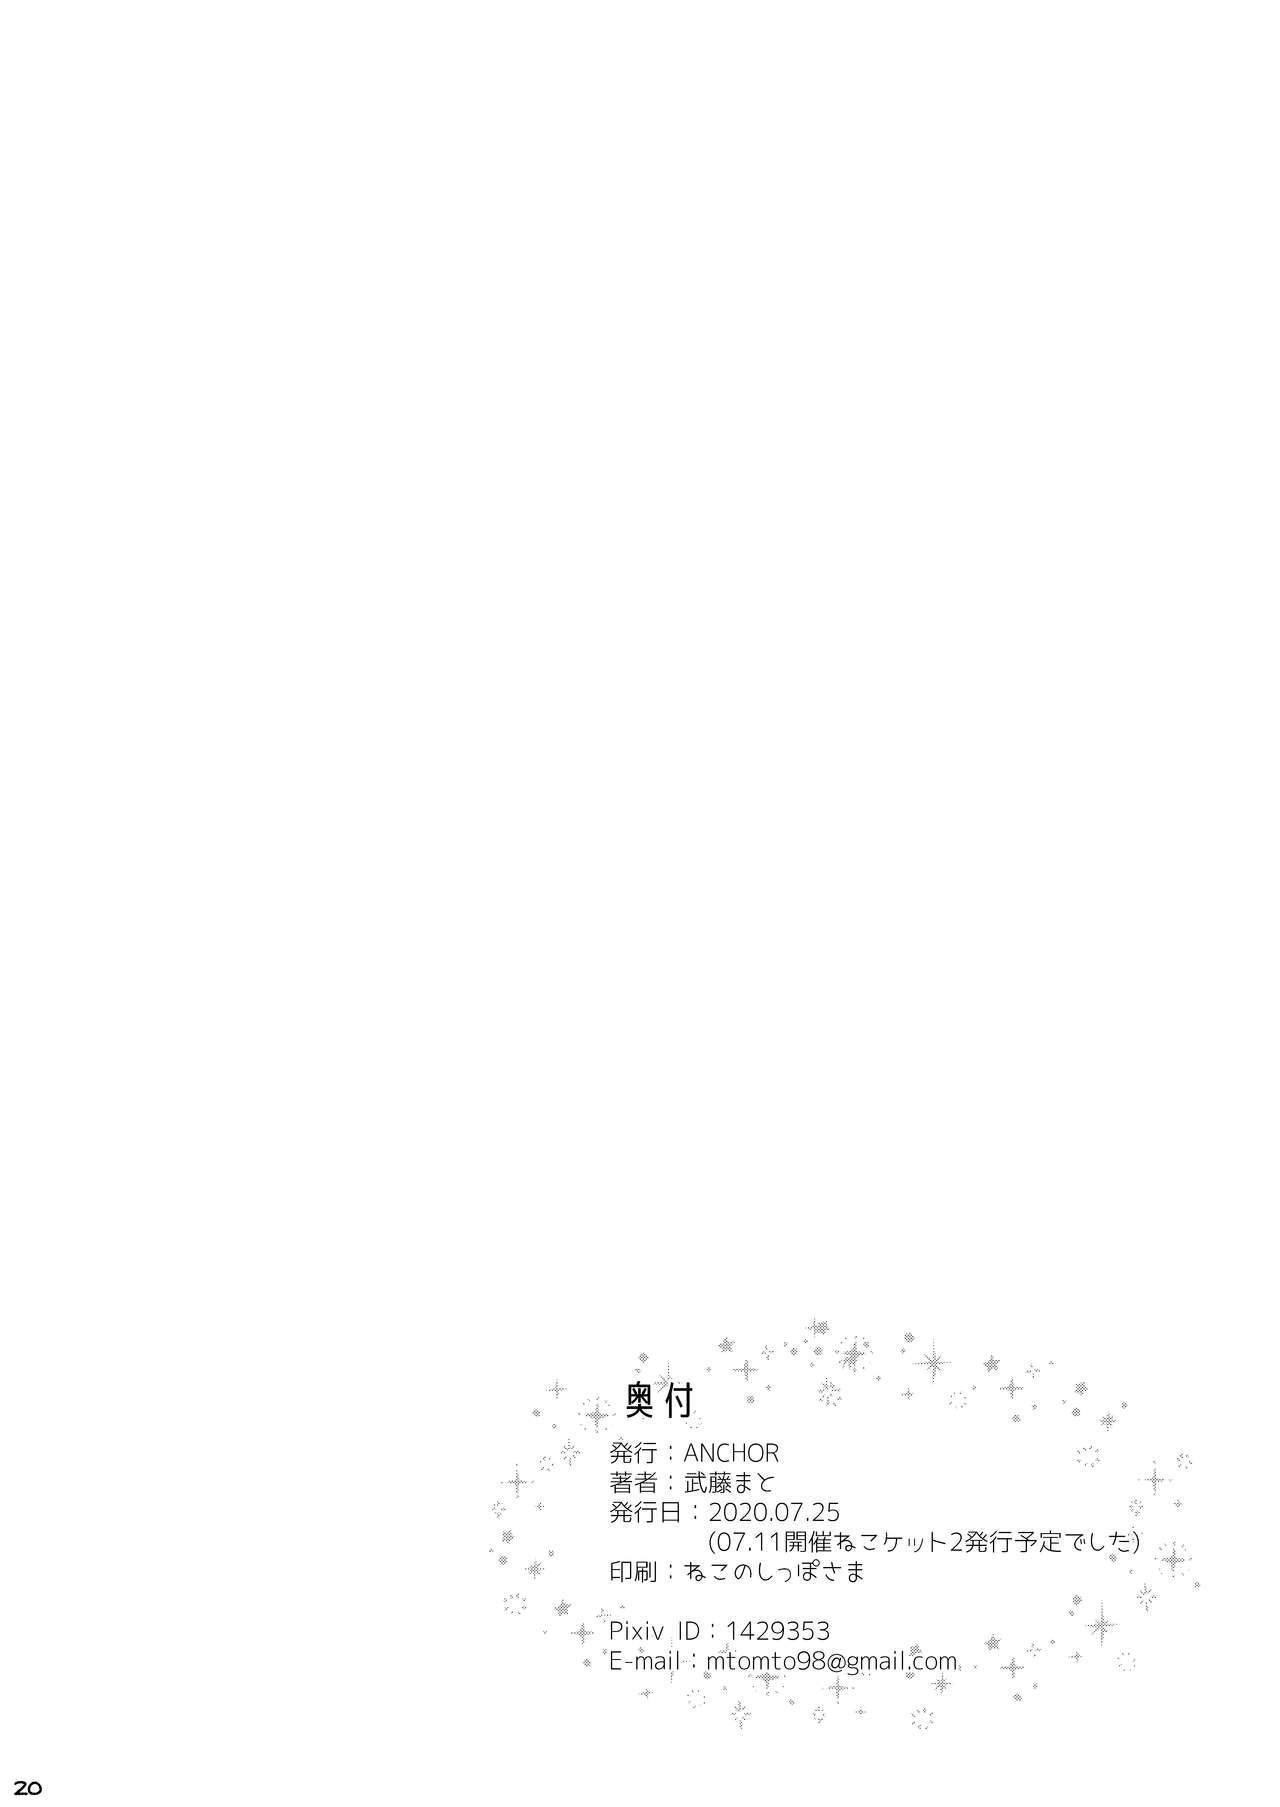 Nekomimichia-chan wa o sawari kinshi! 21